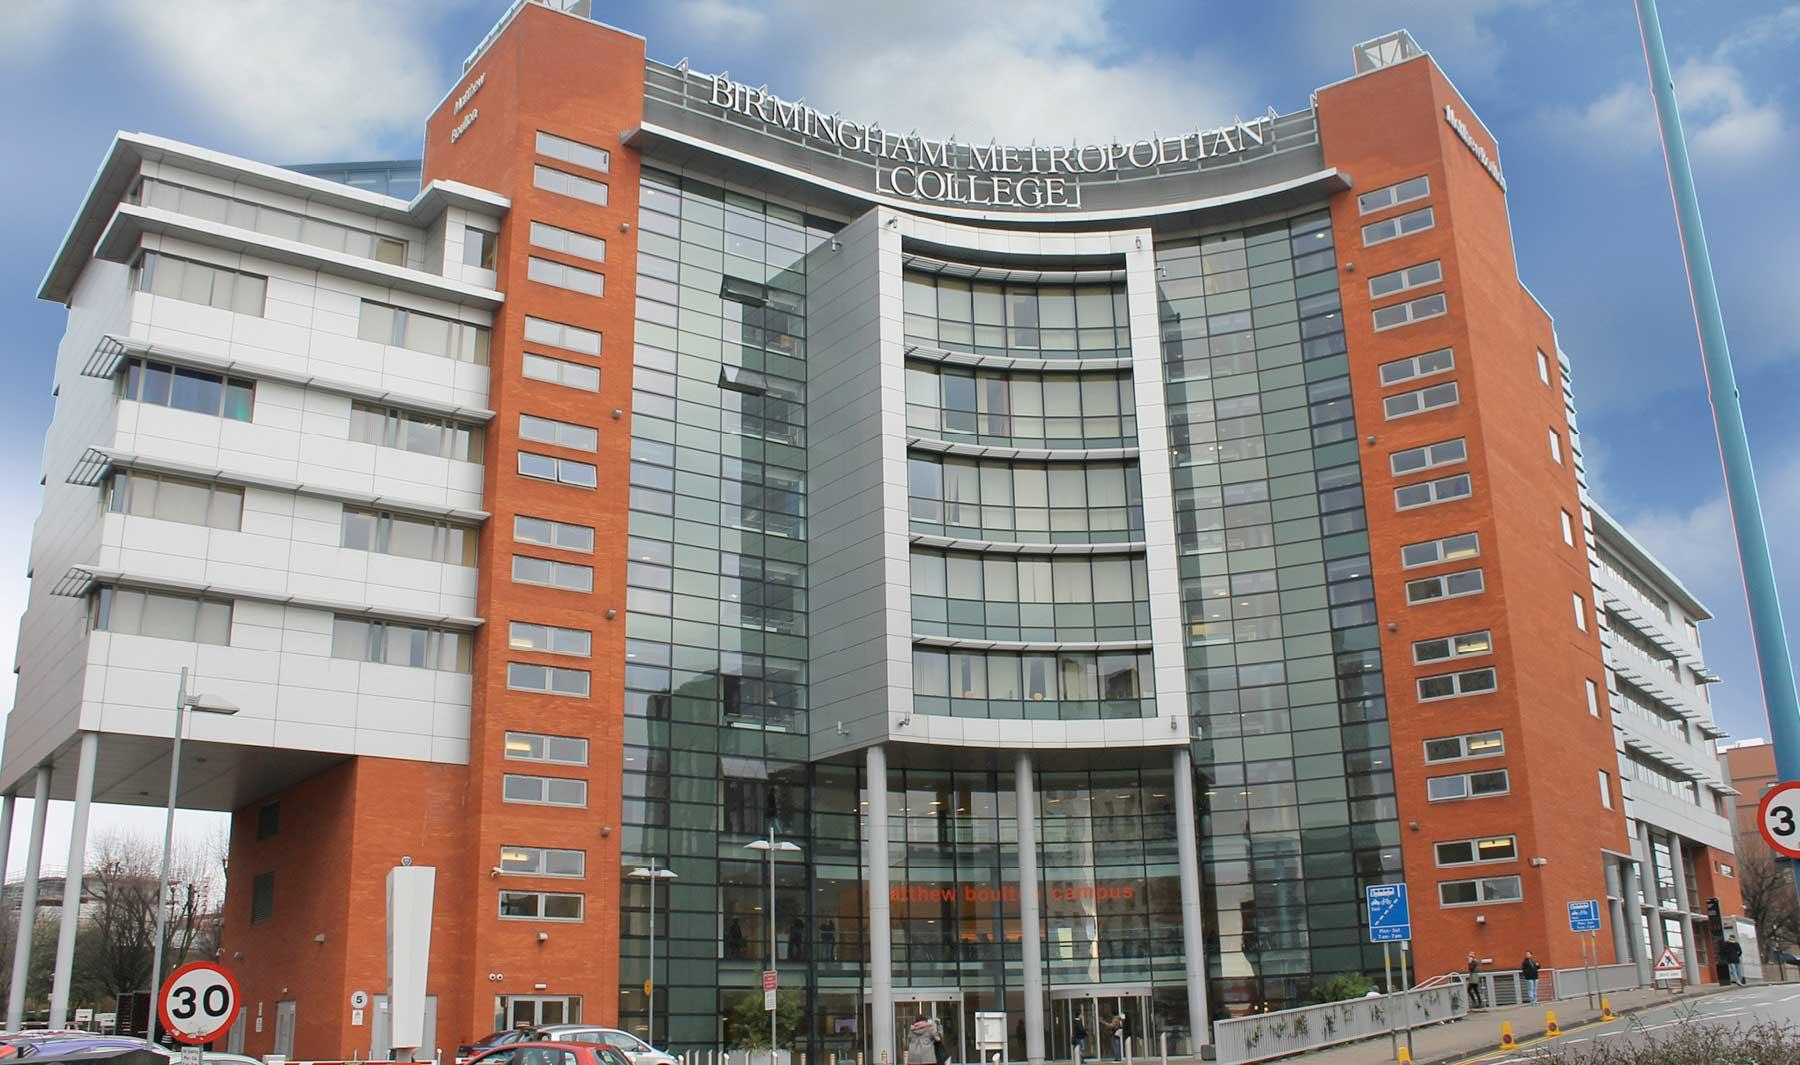 Matthew Boulton College Birmingham Metropolitan College